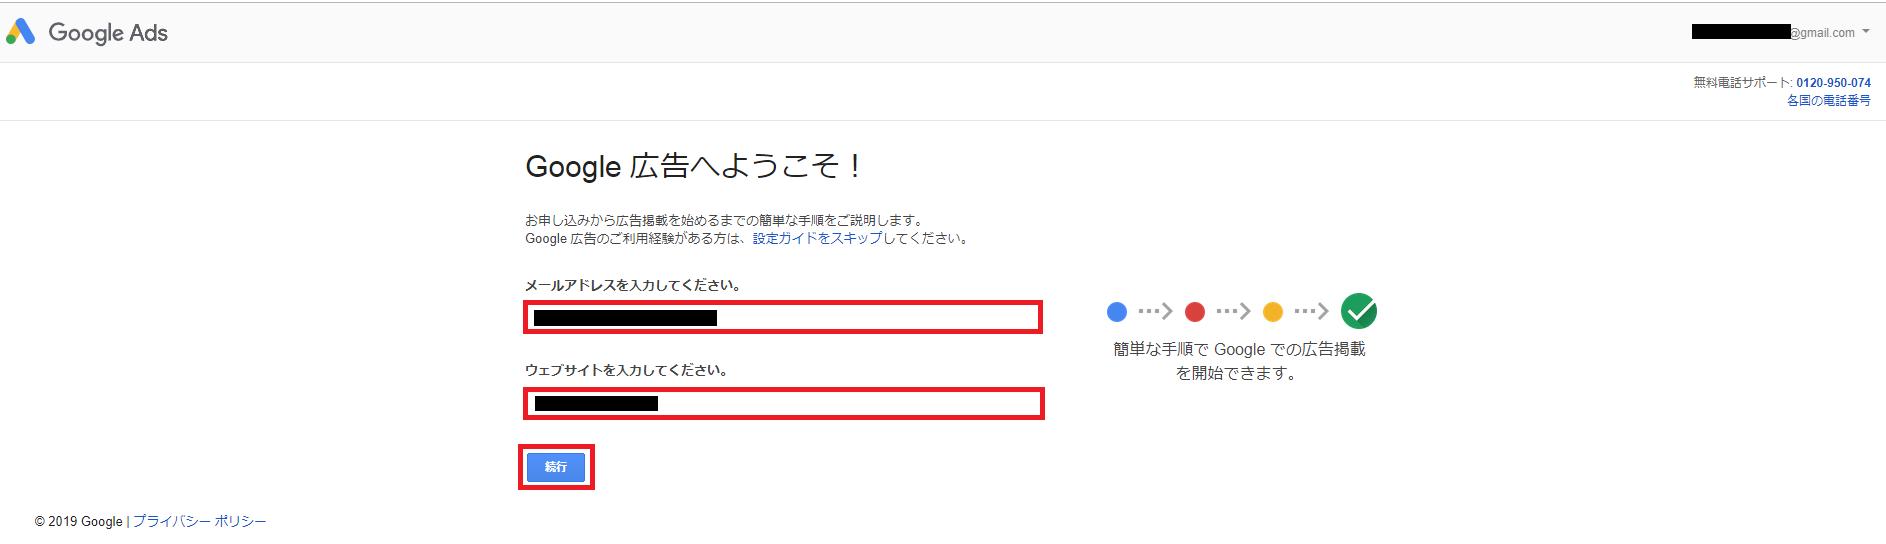 Google広告 アカウント 作成-3